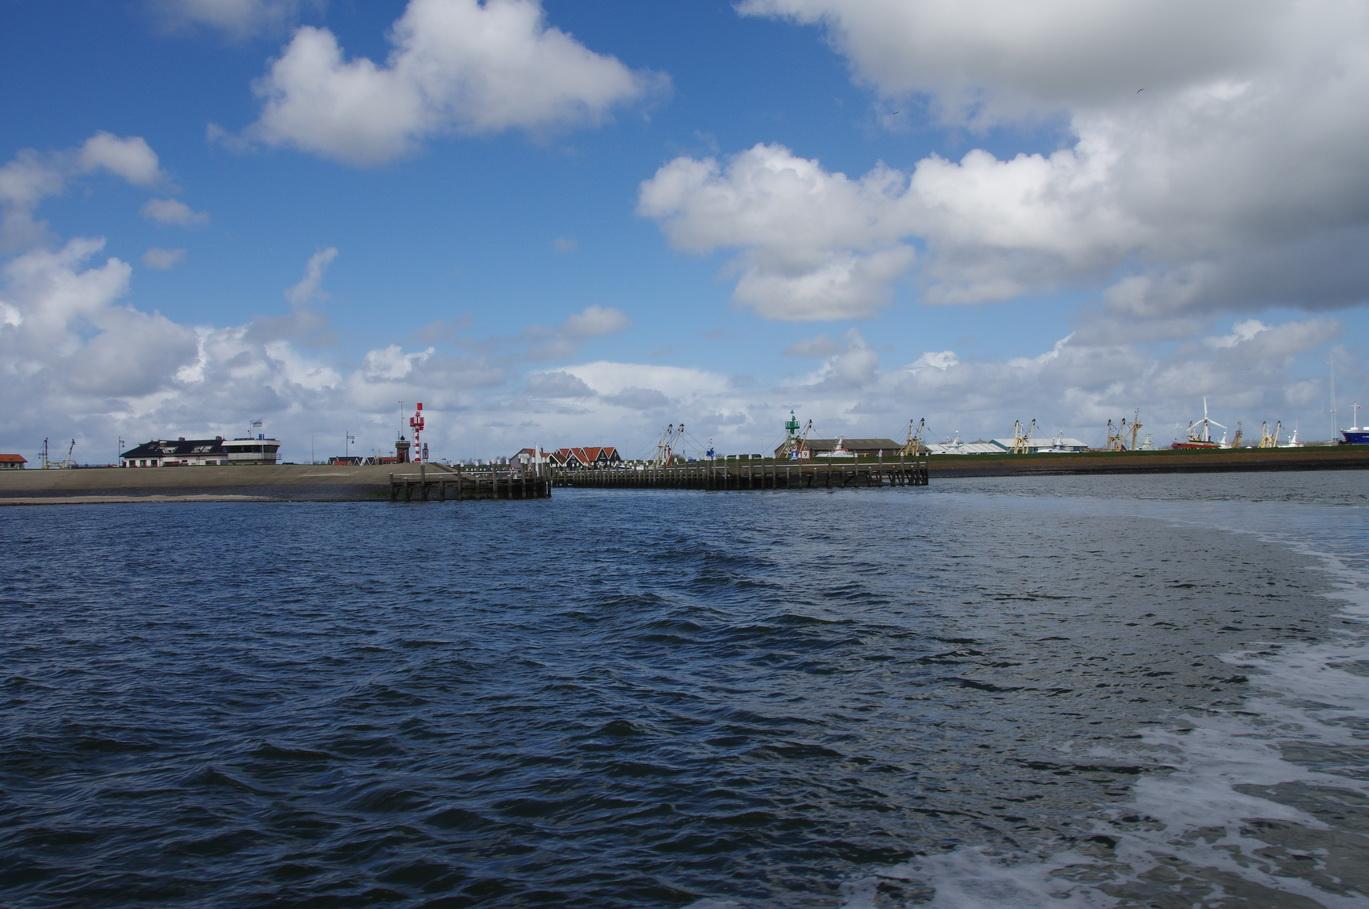 Texel - Schifffahrt Texel 44 TH 1